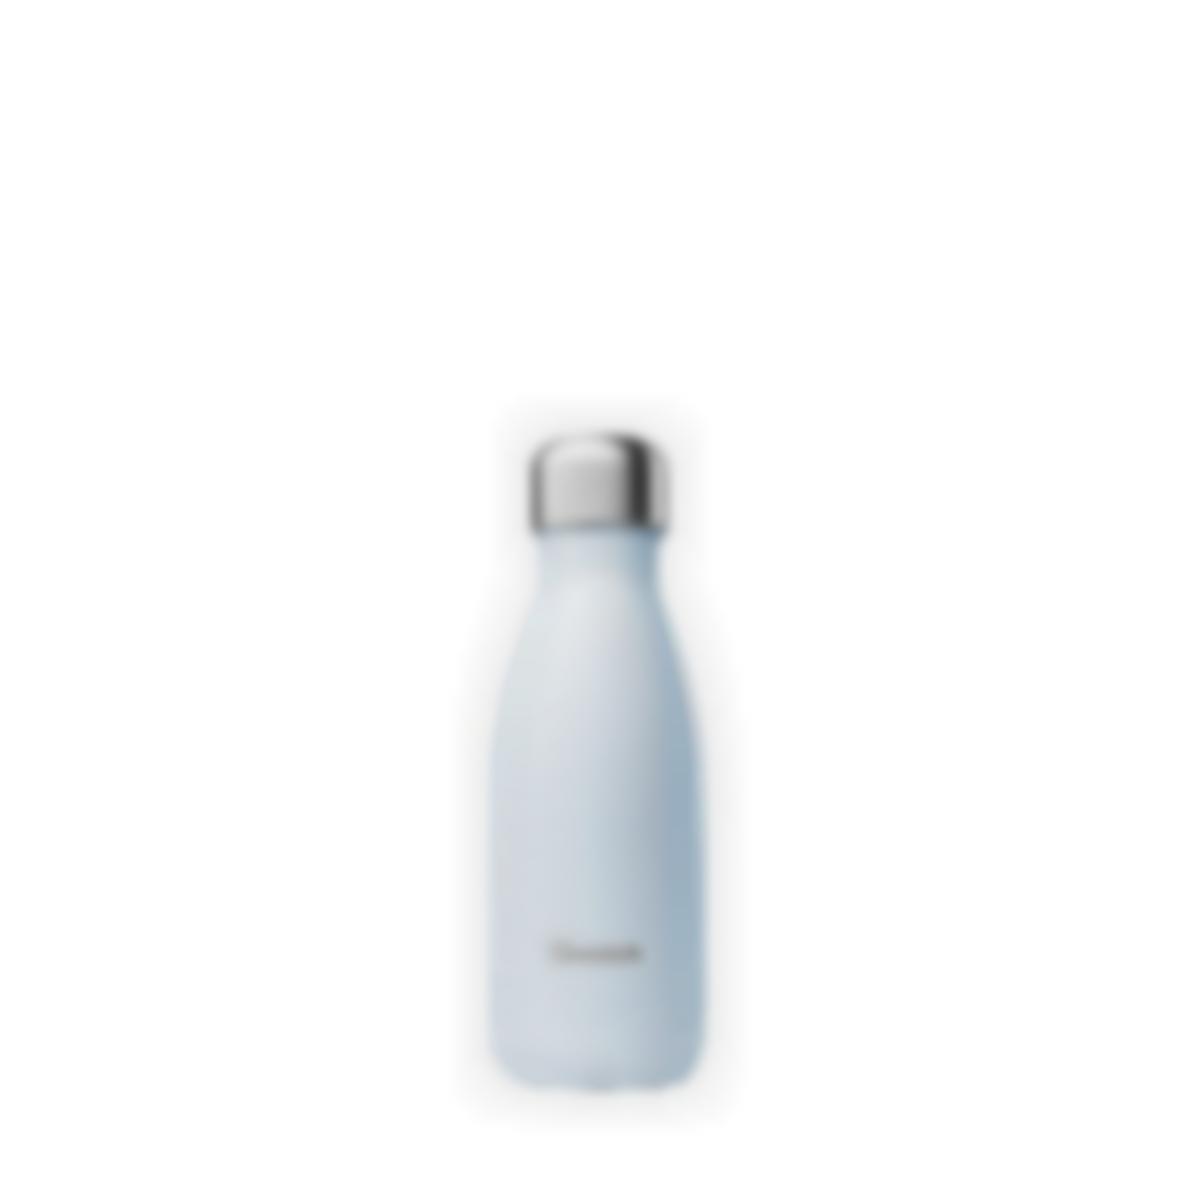 Cantimplora isotérmica Pastel Azul - 260ml - Qwetch